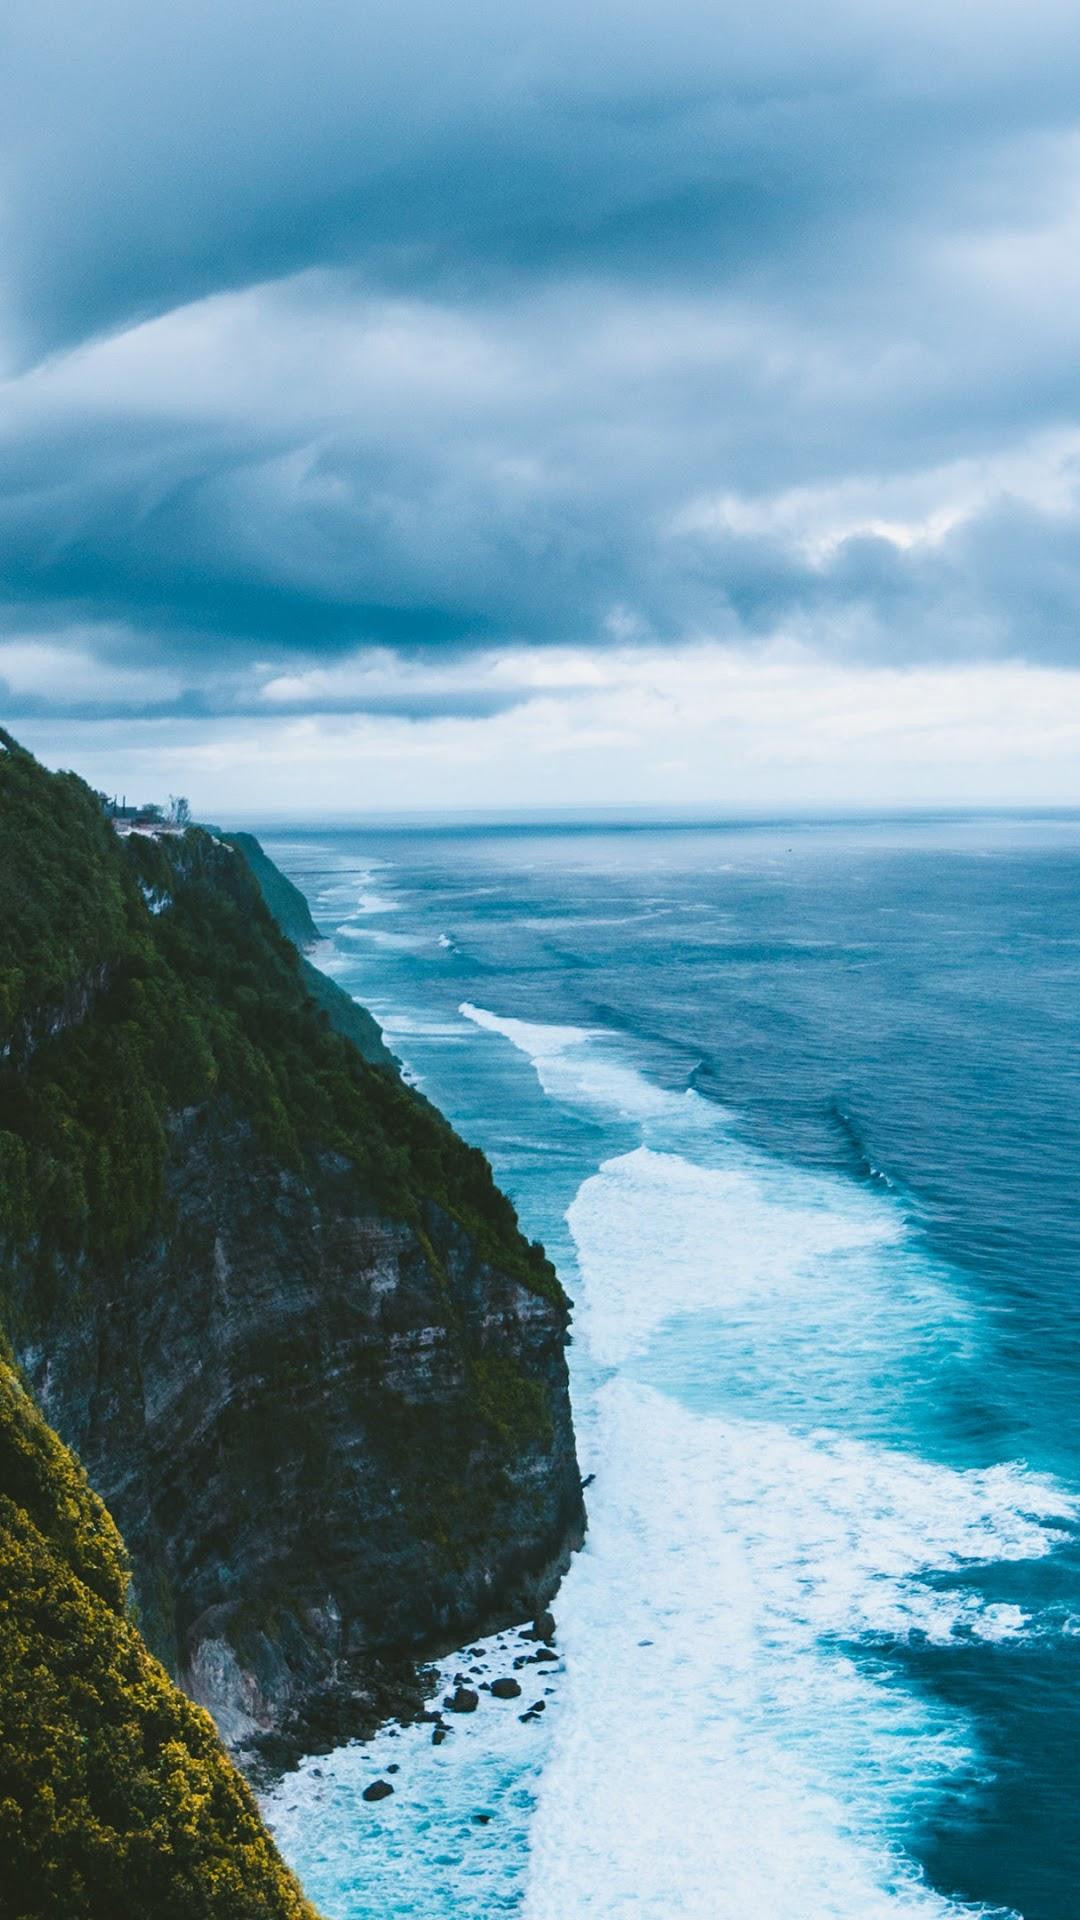 Seascape Sea Clouds Horizon 4k 3840x2160 Iphone 11 Pro Max Wallpaper Ocean 1080x1920 Wallpaper Teahub Io